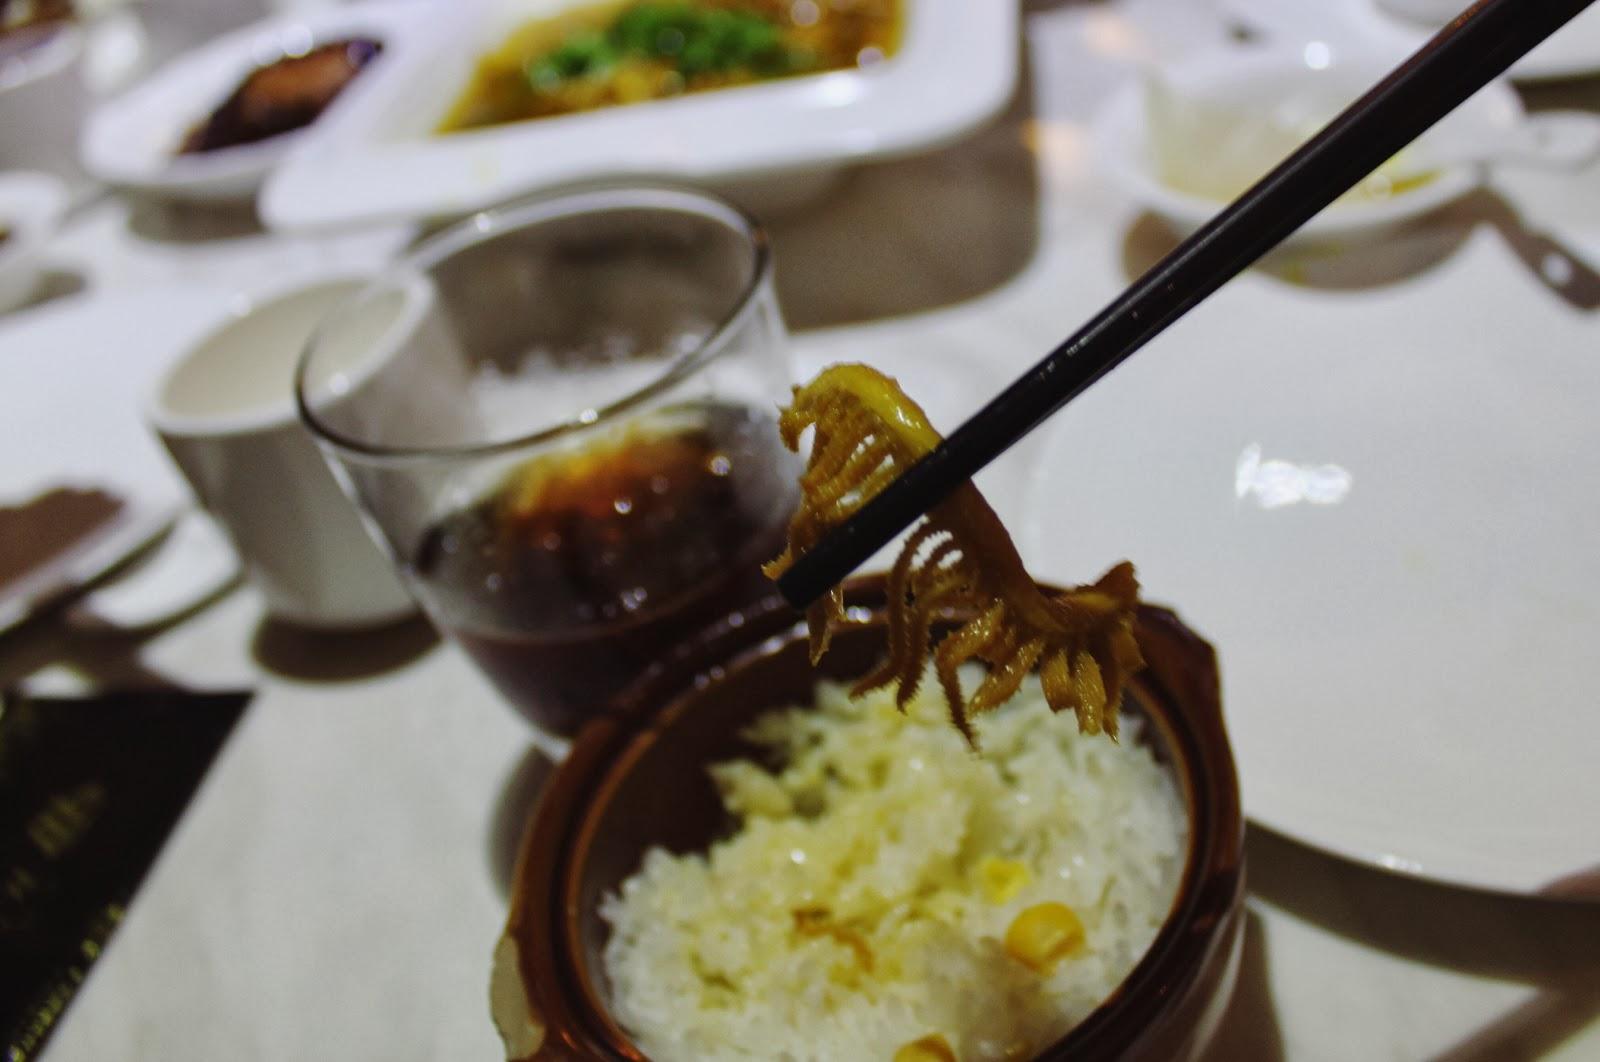 老房子水岸元年食府 The Old House 四川菜 Szechuan Cuisine @ 中国广东深圳华侨城 Baishi Rd, Shenzhen, Guangdong, China